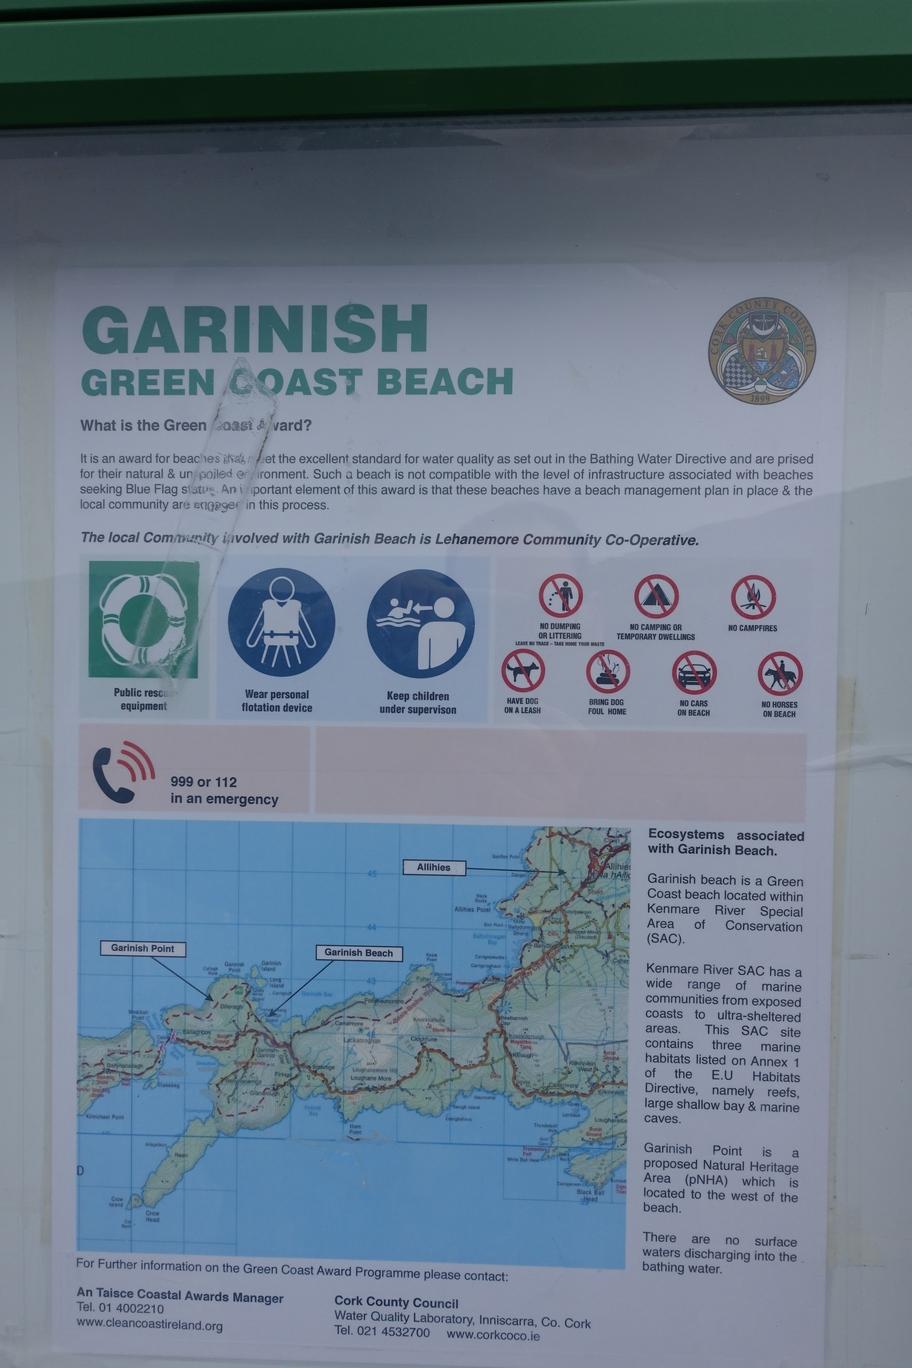 Garinish Green Coast Beach